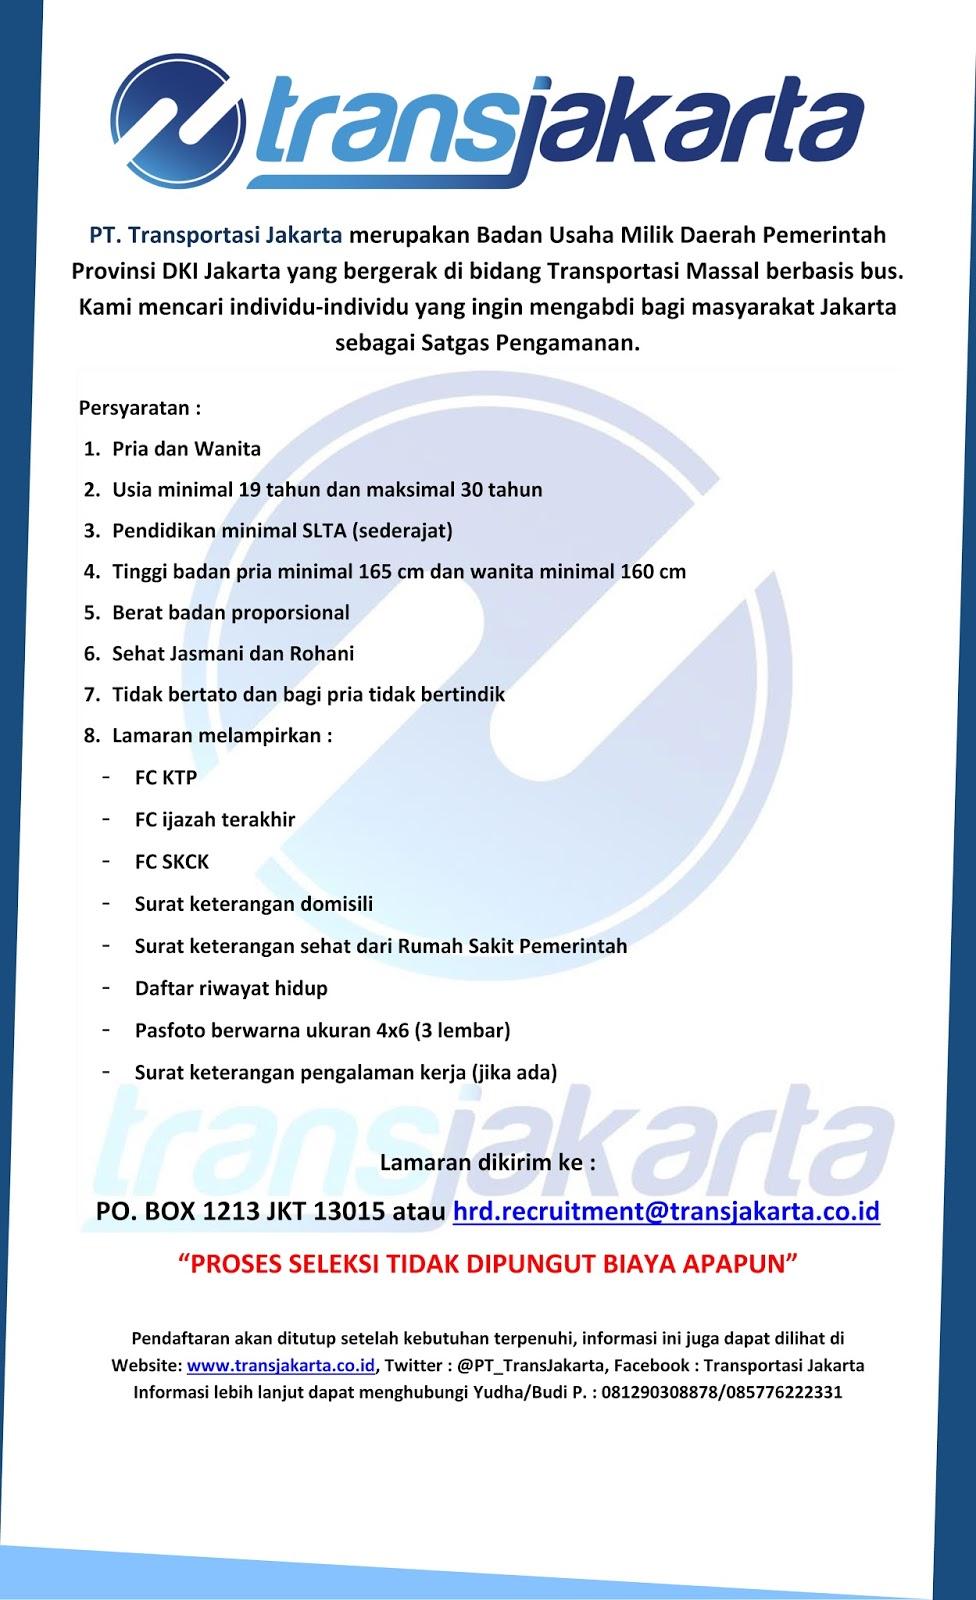 Lowongan Kerja Transjakarta Tahun 2016